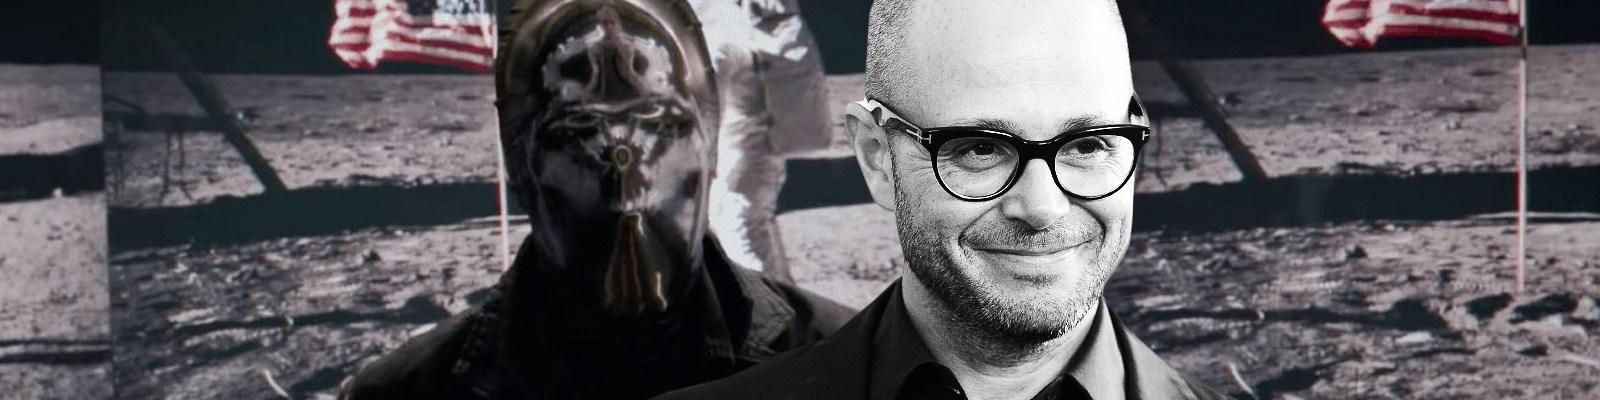 Damon Lindelof On Exploring Modern Themes Through 'Watchmen'